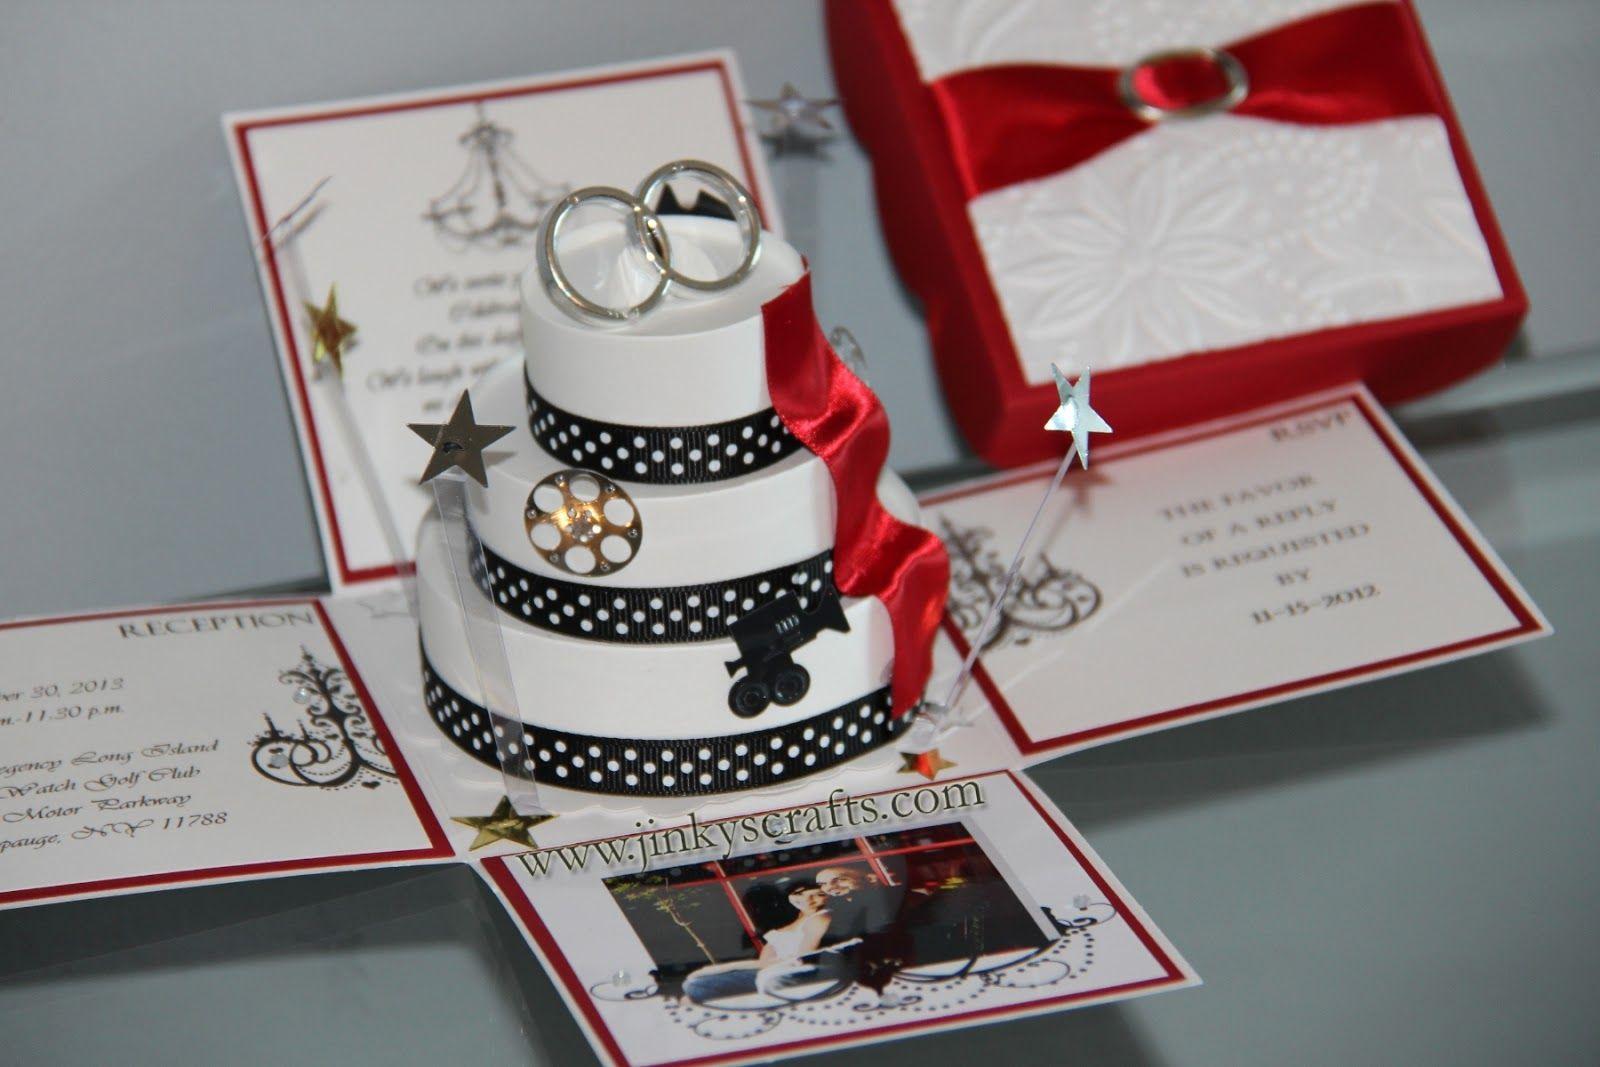 Boxed wedding invite   Wedding ideas   Pinterest   Wedding and Weddings